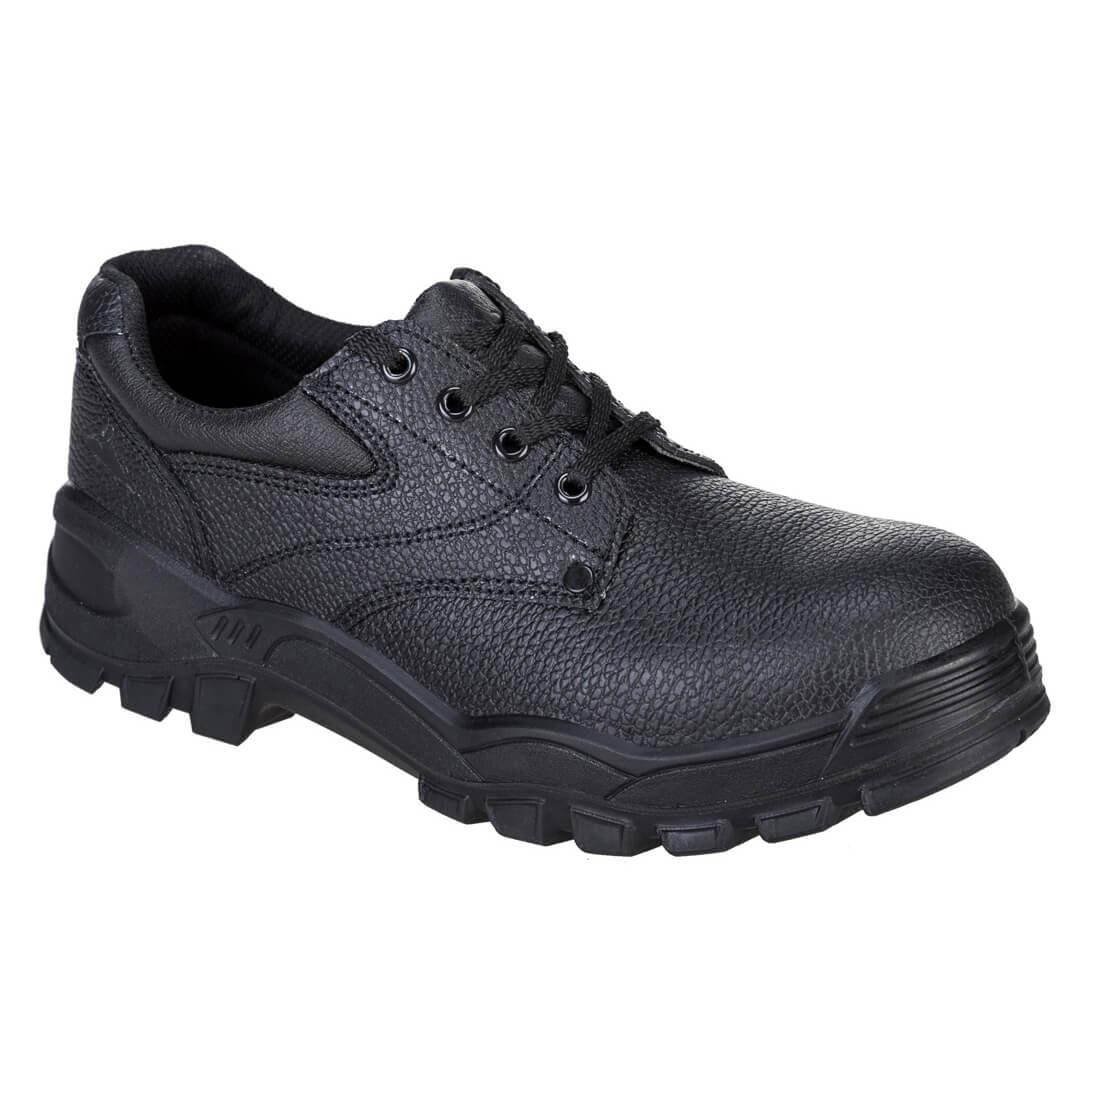 Pantof de Protectie S1P Steelite™ - Incaltaminte de protectie